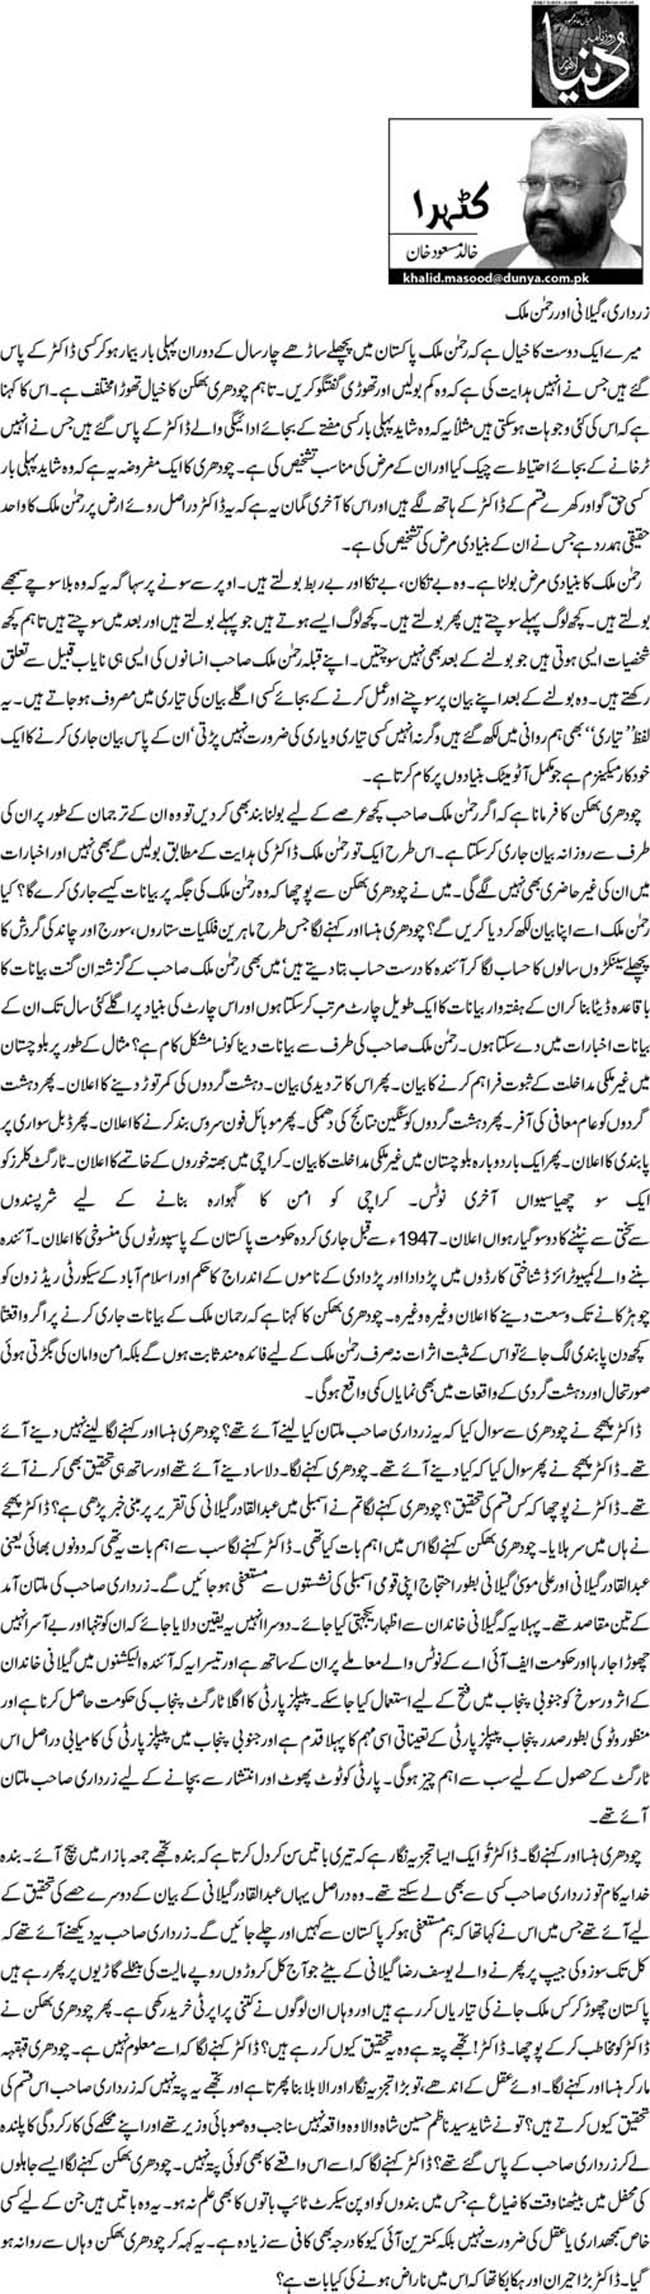 Zardari, Gilani aur Rehman Malik - Khalid Masood Khan